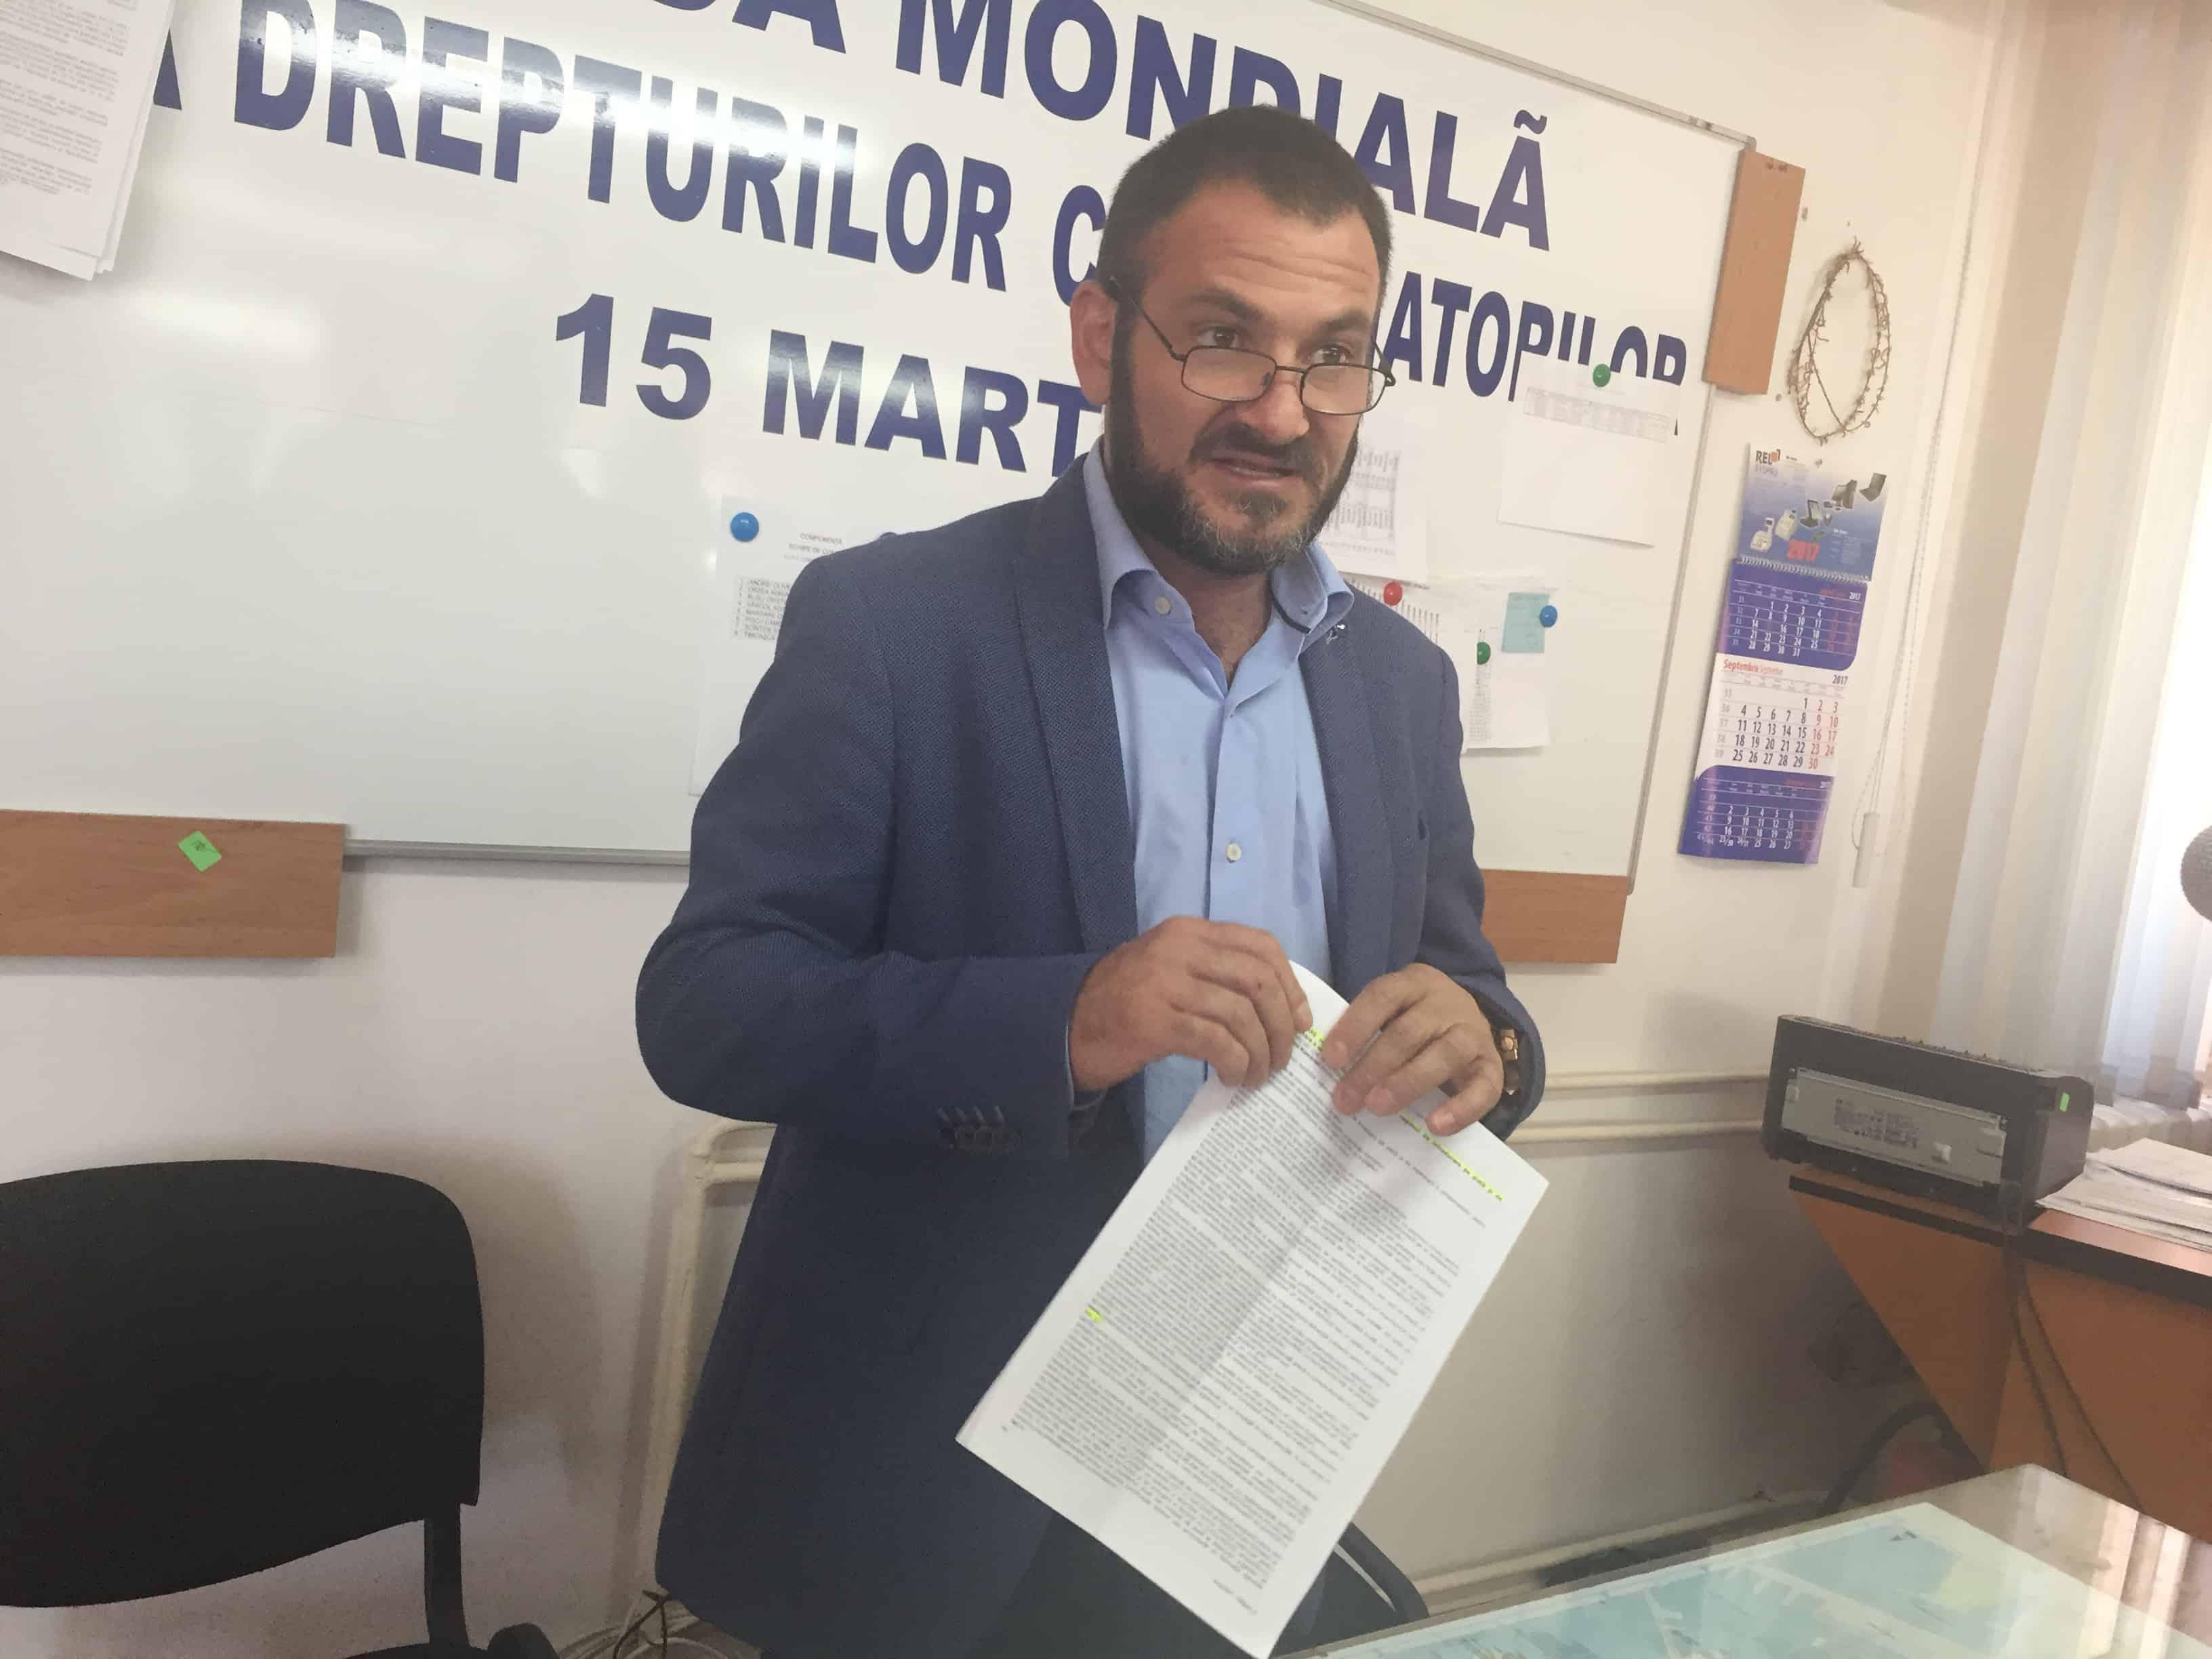 Horia Constantinescu0790